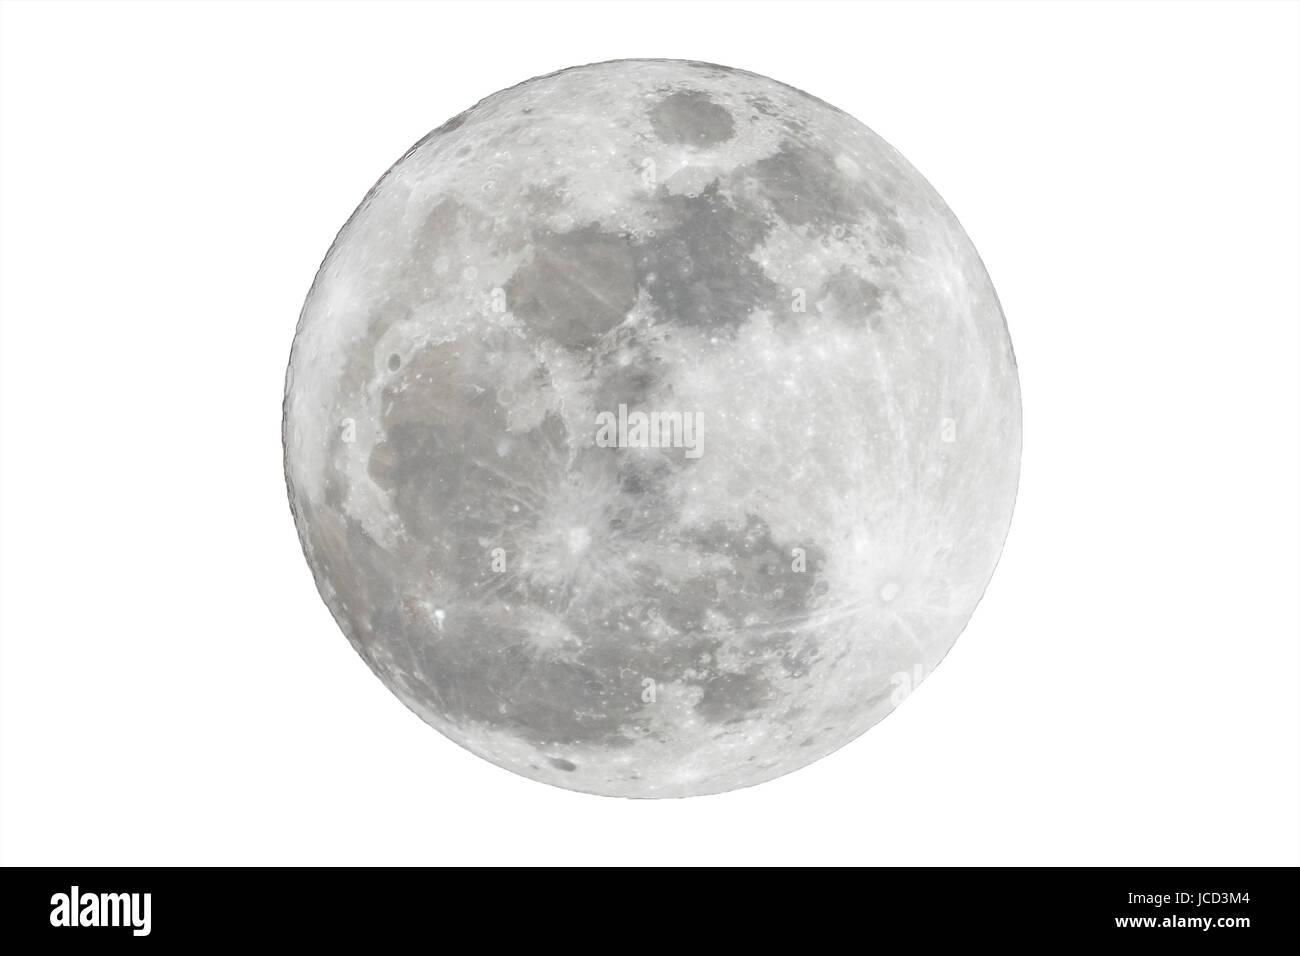 Full moon isolated over white background - Stock Image